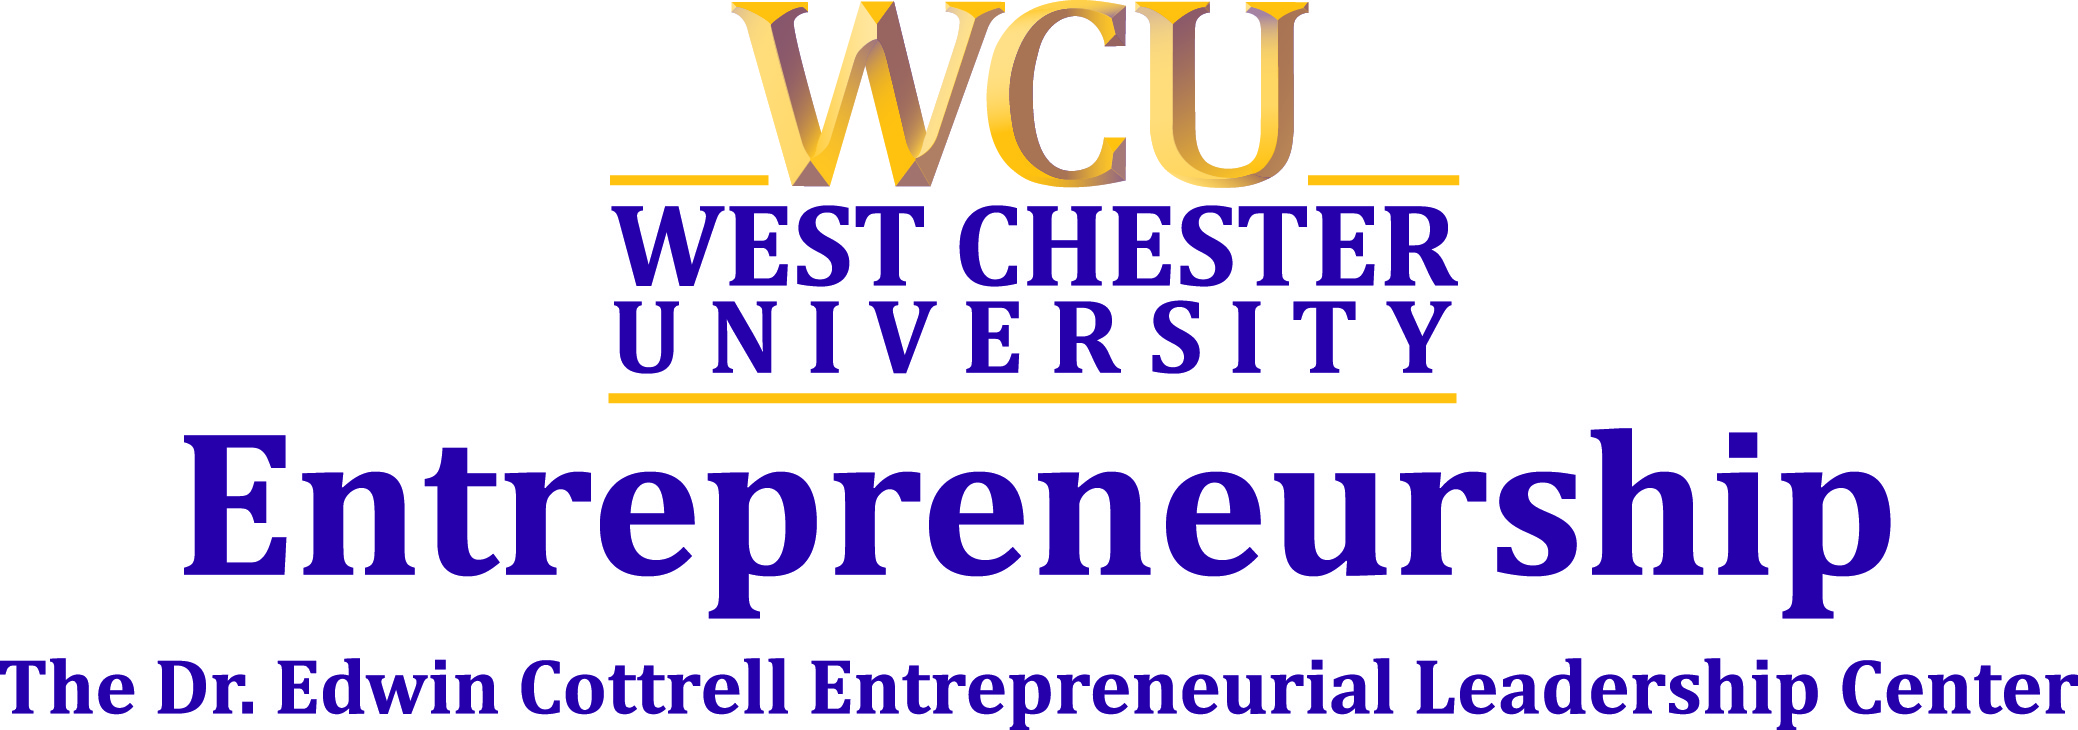 WCU Cottrell Center